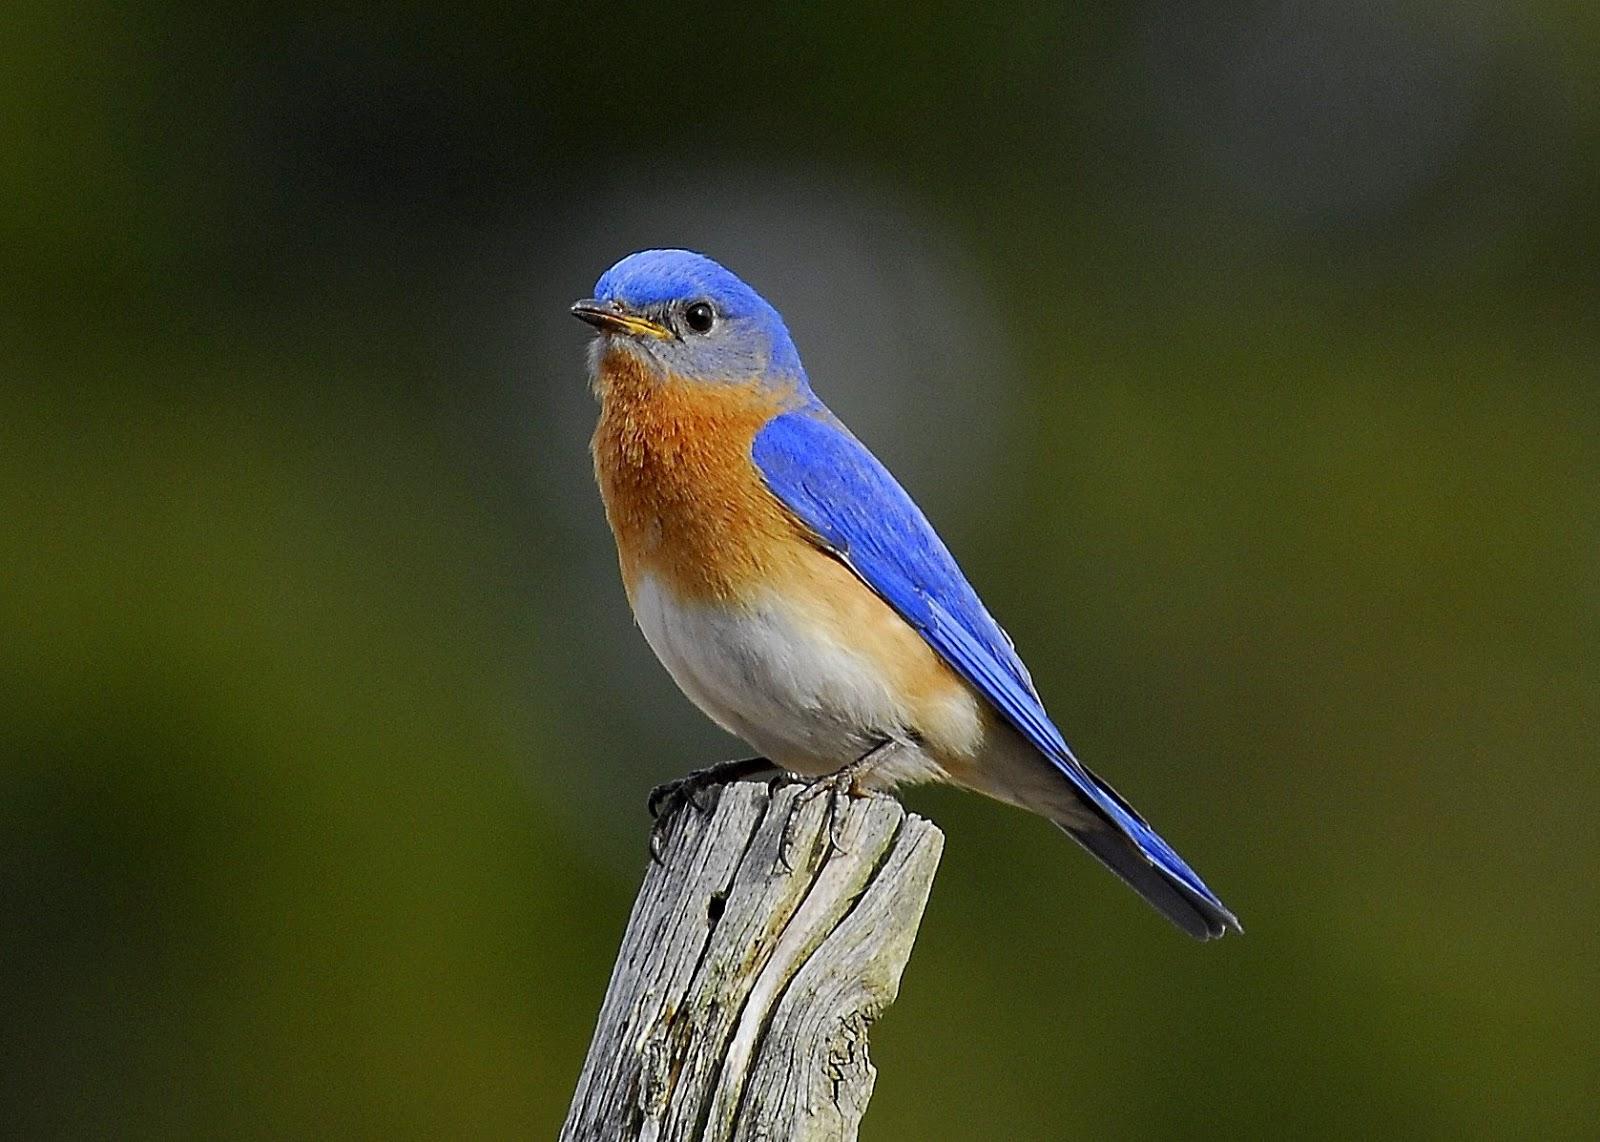 The Blue Bird Analysis